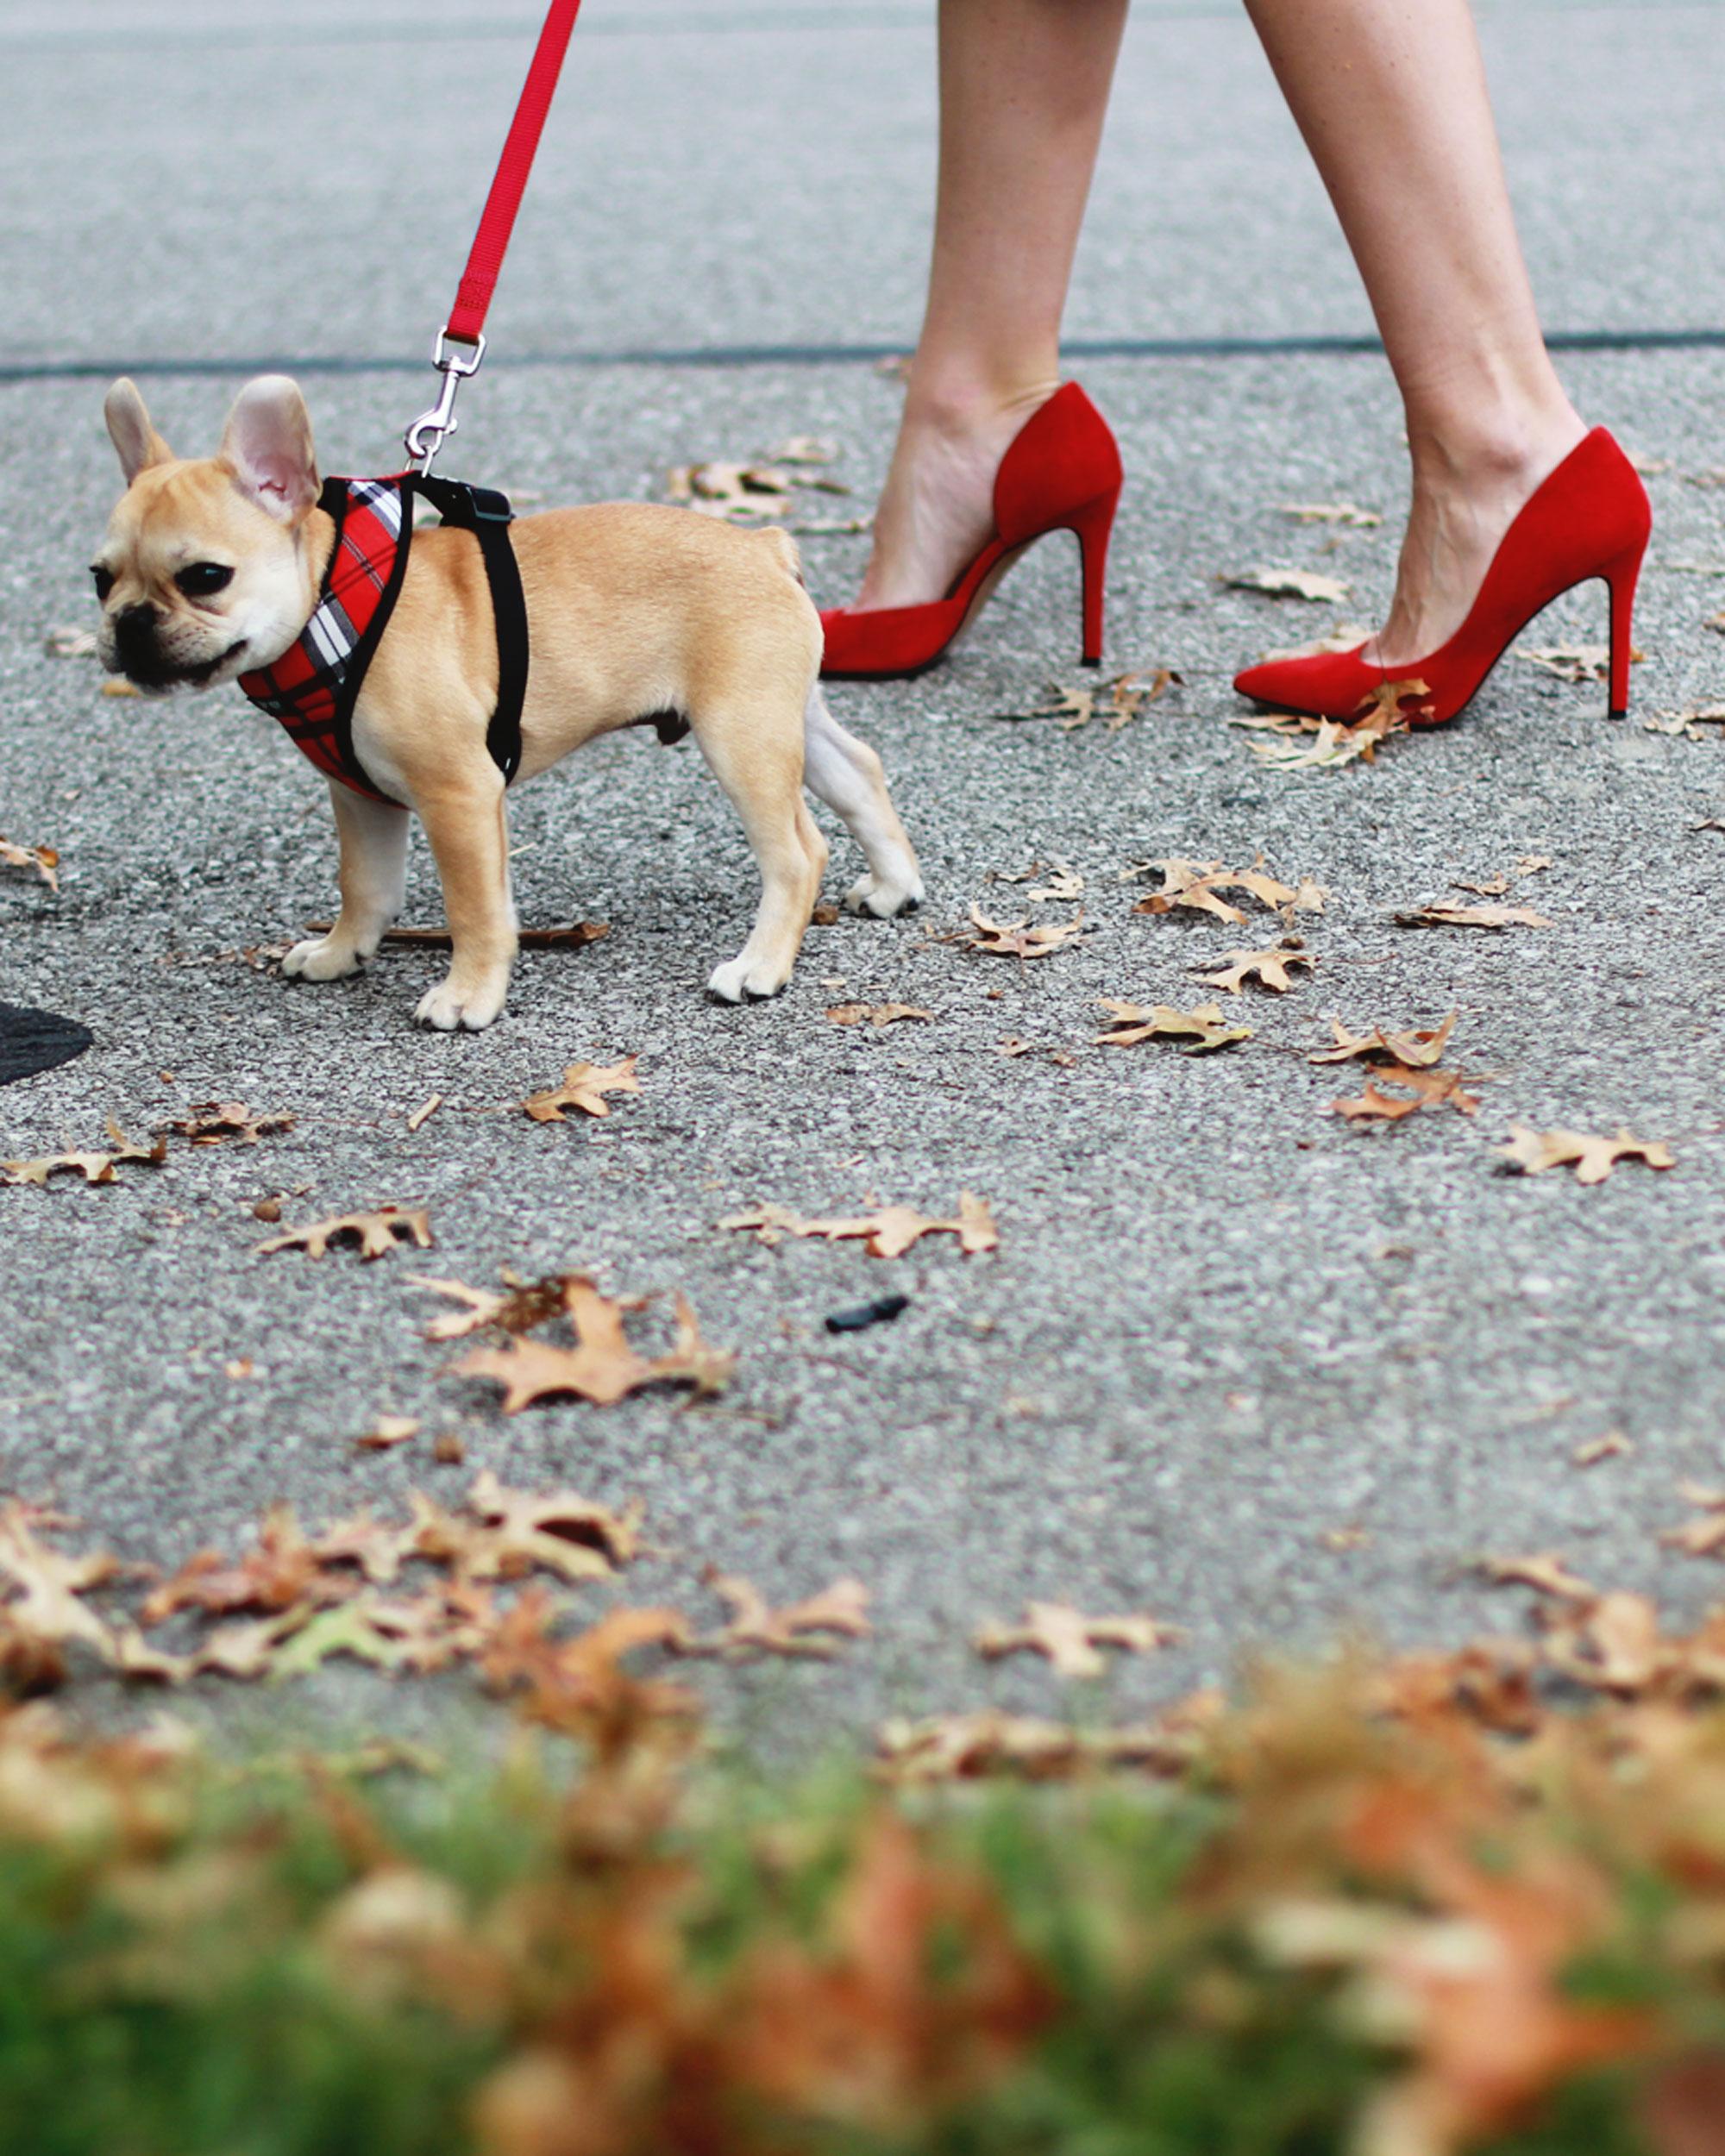 Fall Fashion, JOA Lace Body-Con Dress, Wedding Guest Attire, Statement Necklace, Midi Dress, Jessica Simpson Claudette Pumps, Fawn French Bulldog Puppy